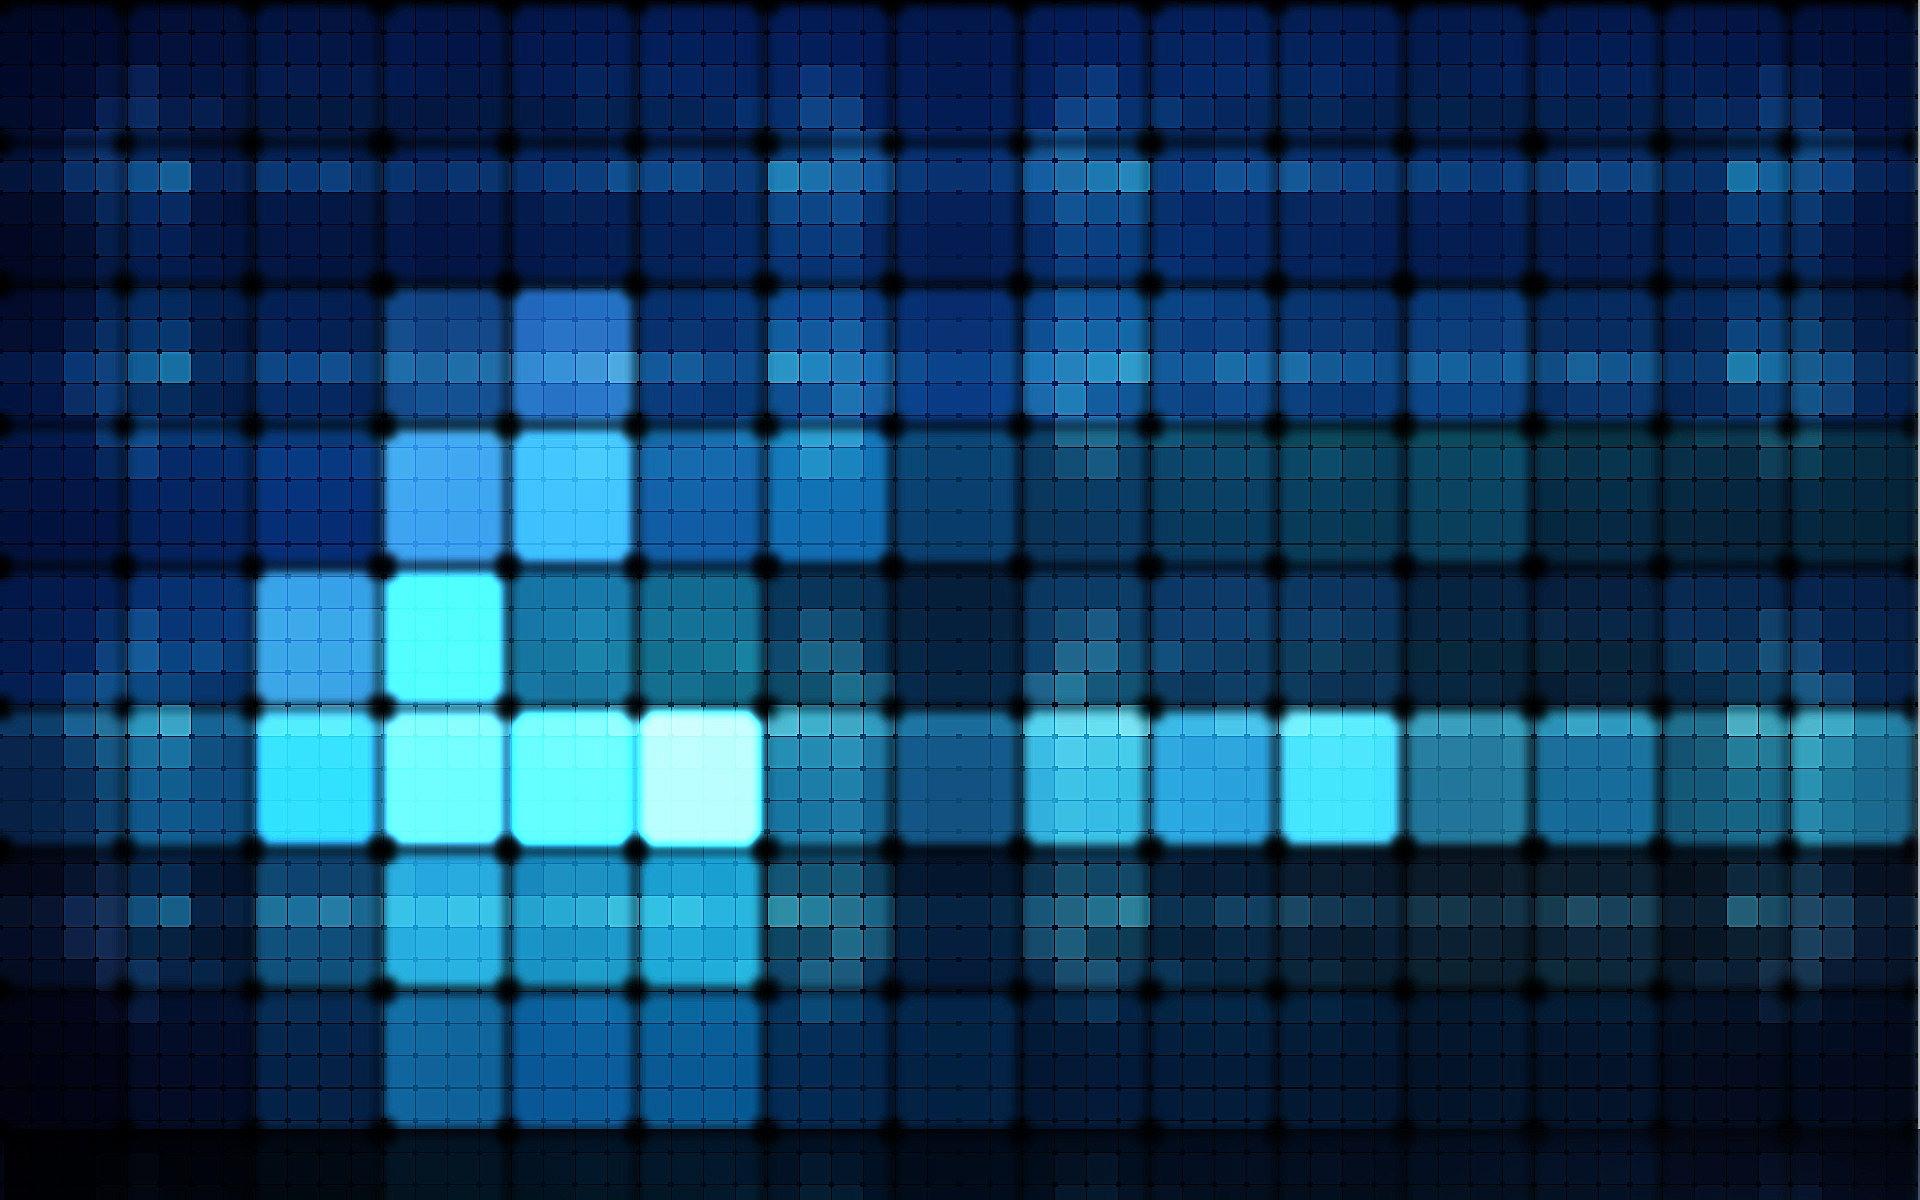 Glowing Grid Wallpaper